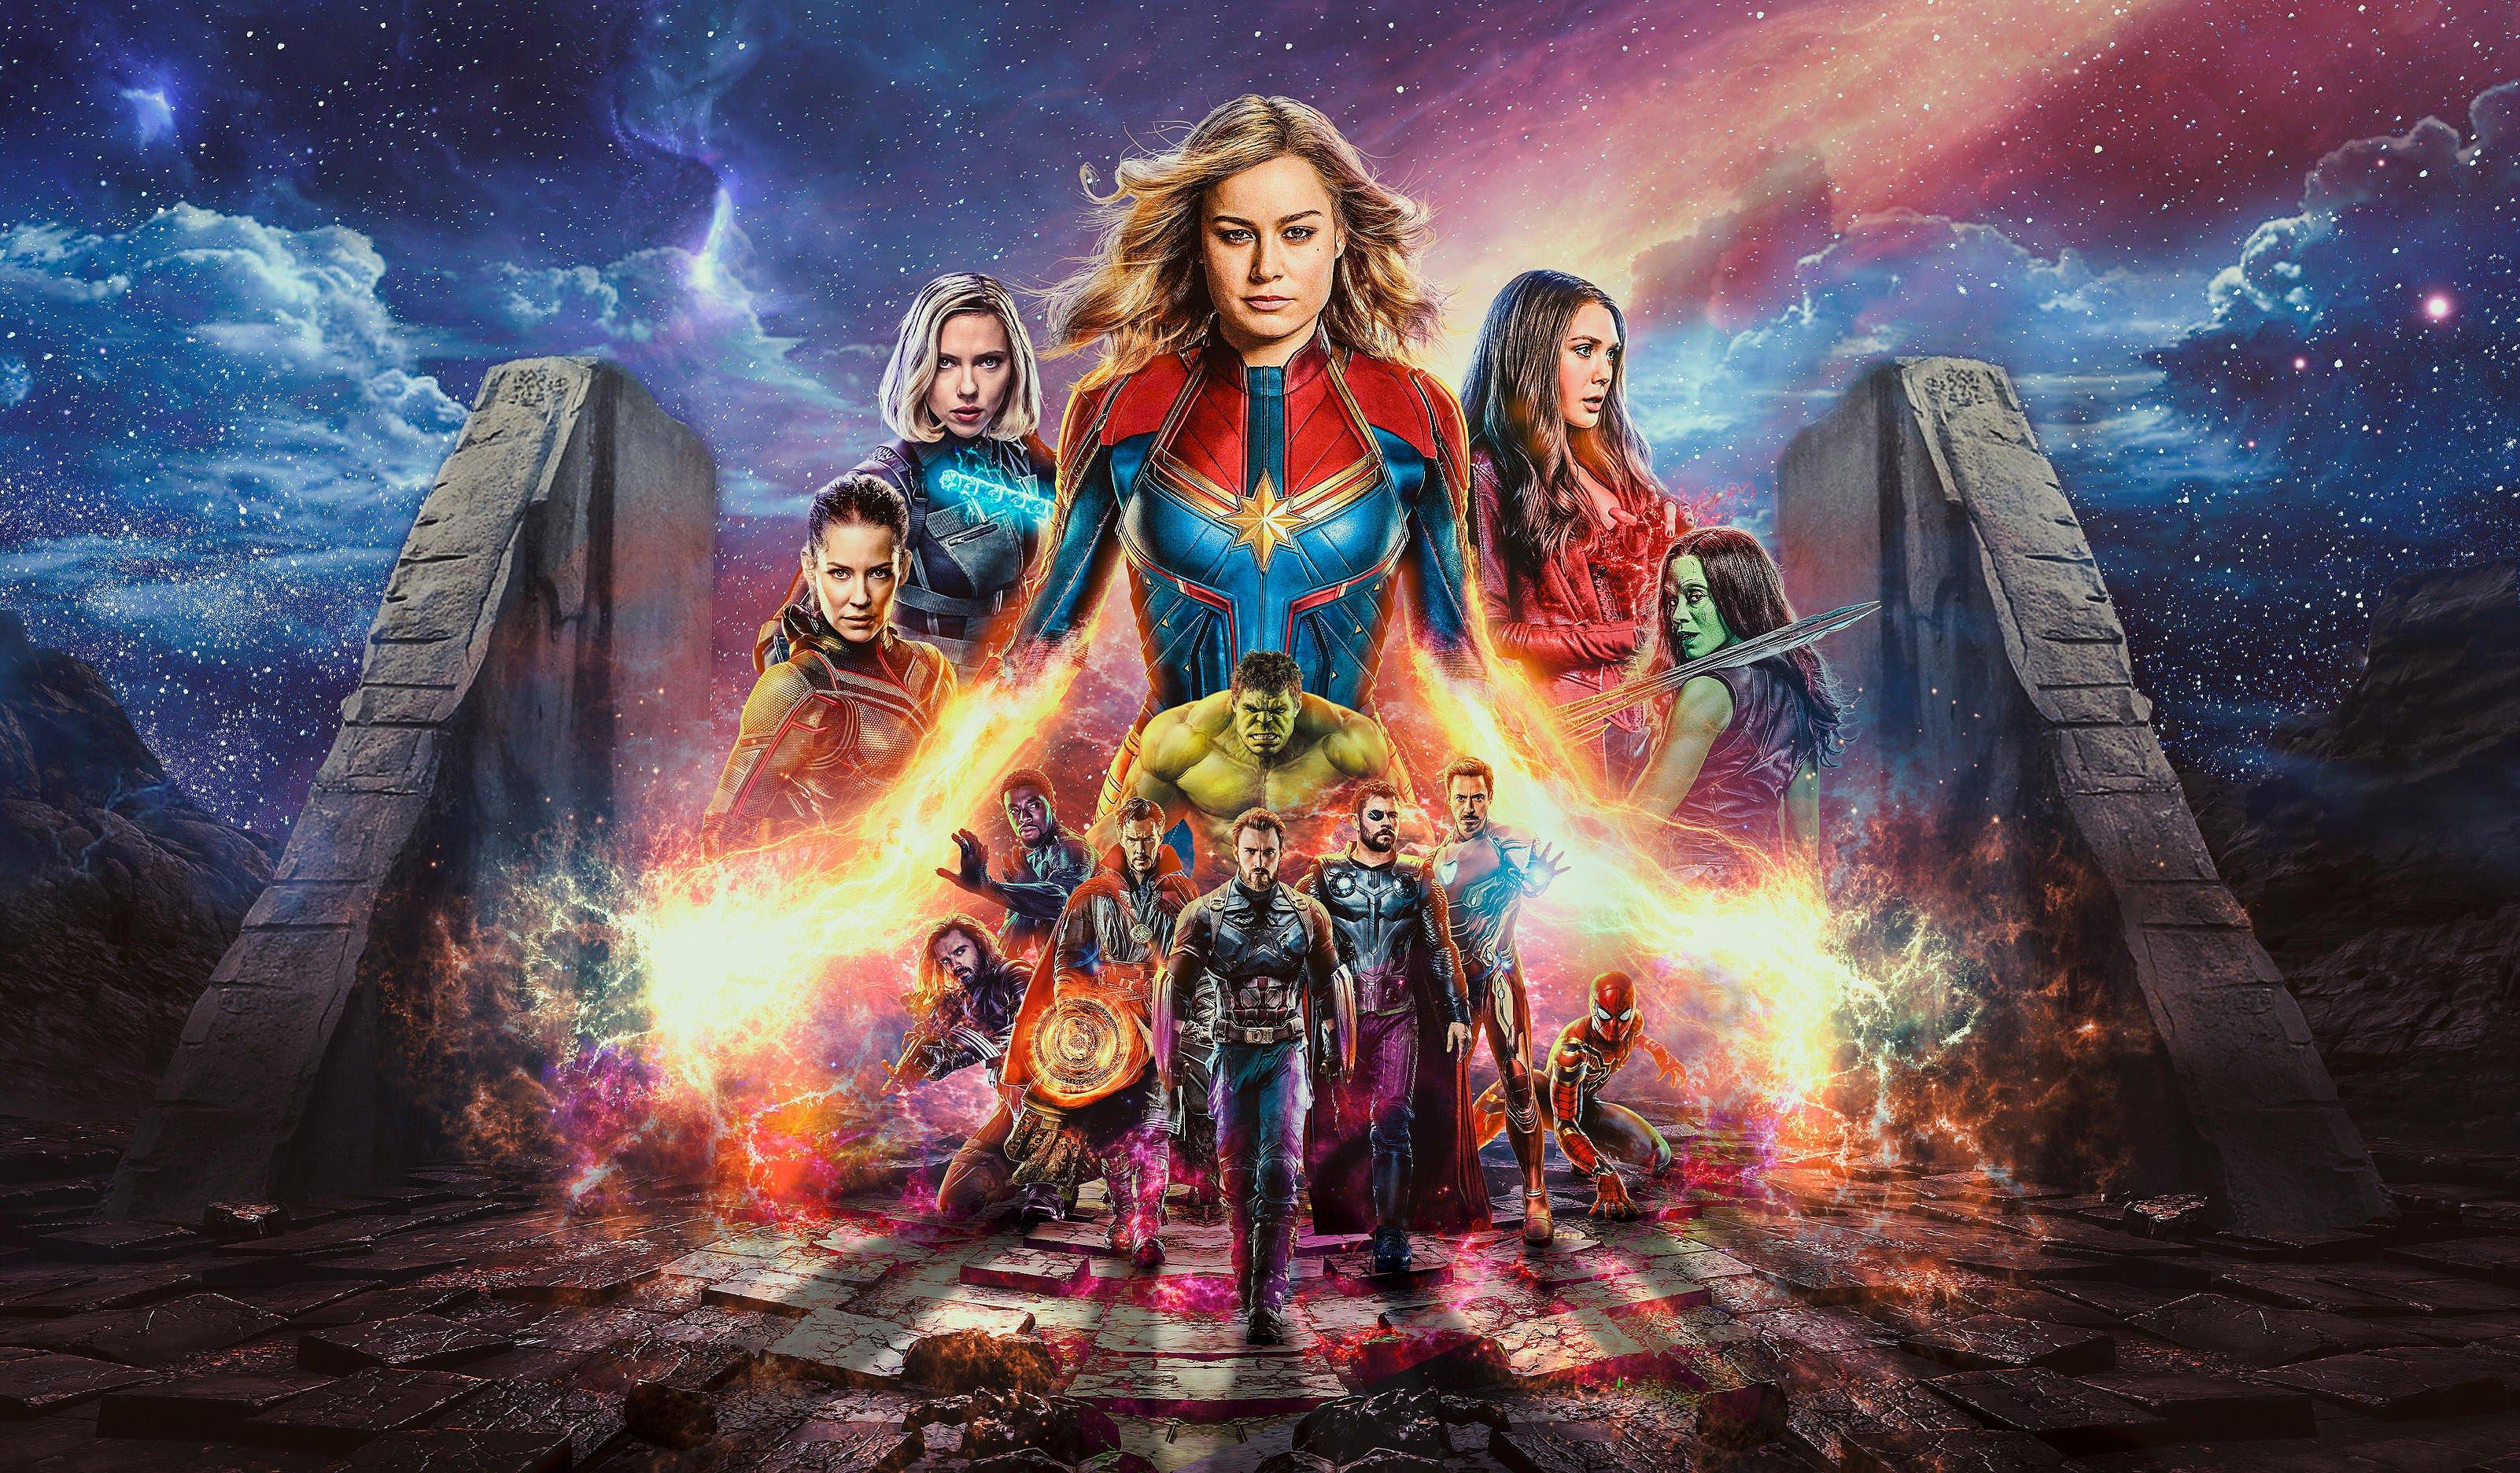 Мстители Финал, месники, Avengers End Game, 4k обои